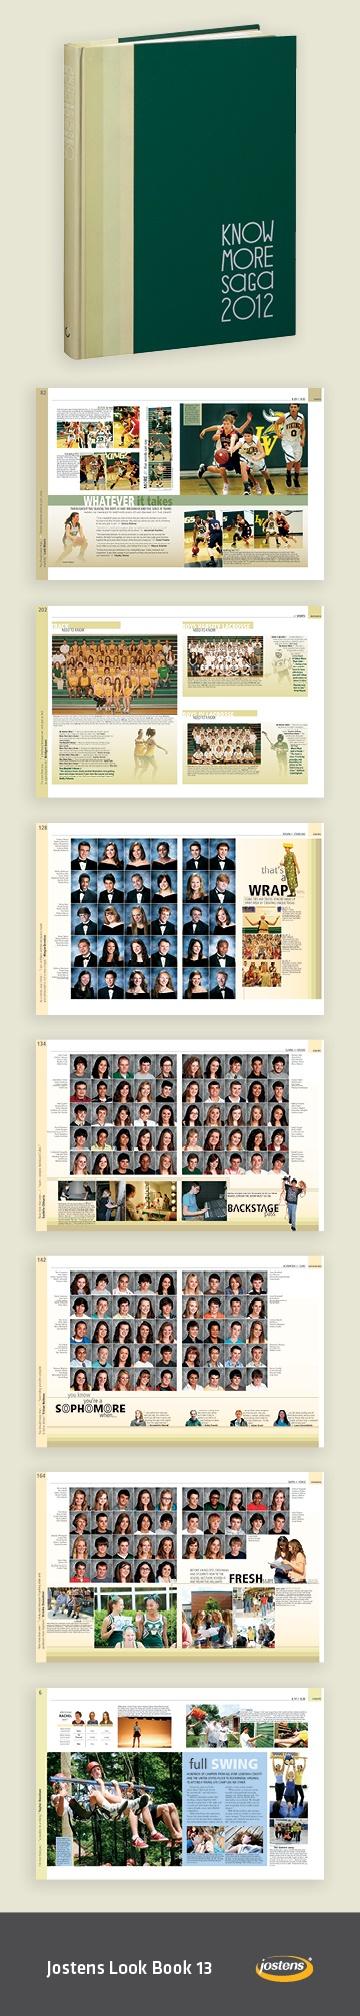 [Saga, Loudoun Valley High School, Purcellville, VA] #Yearbook #BookLook